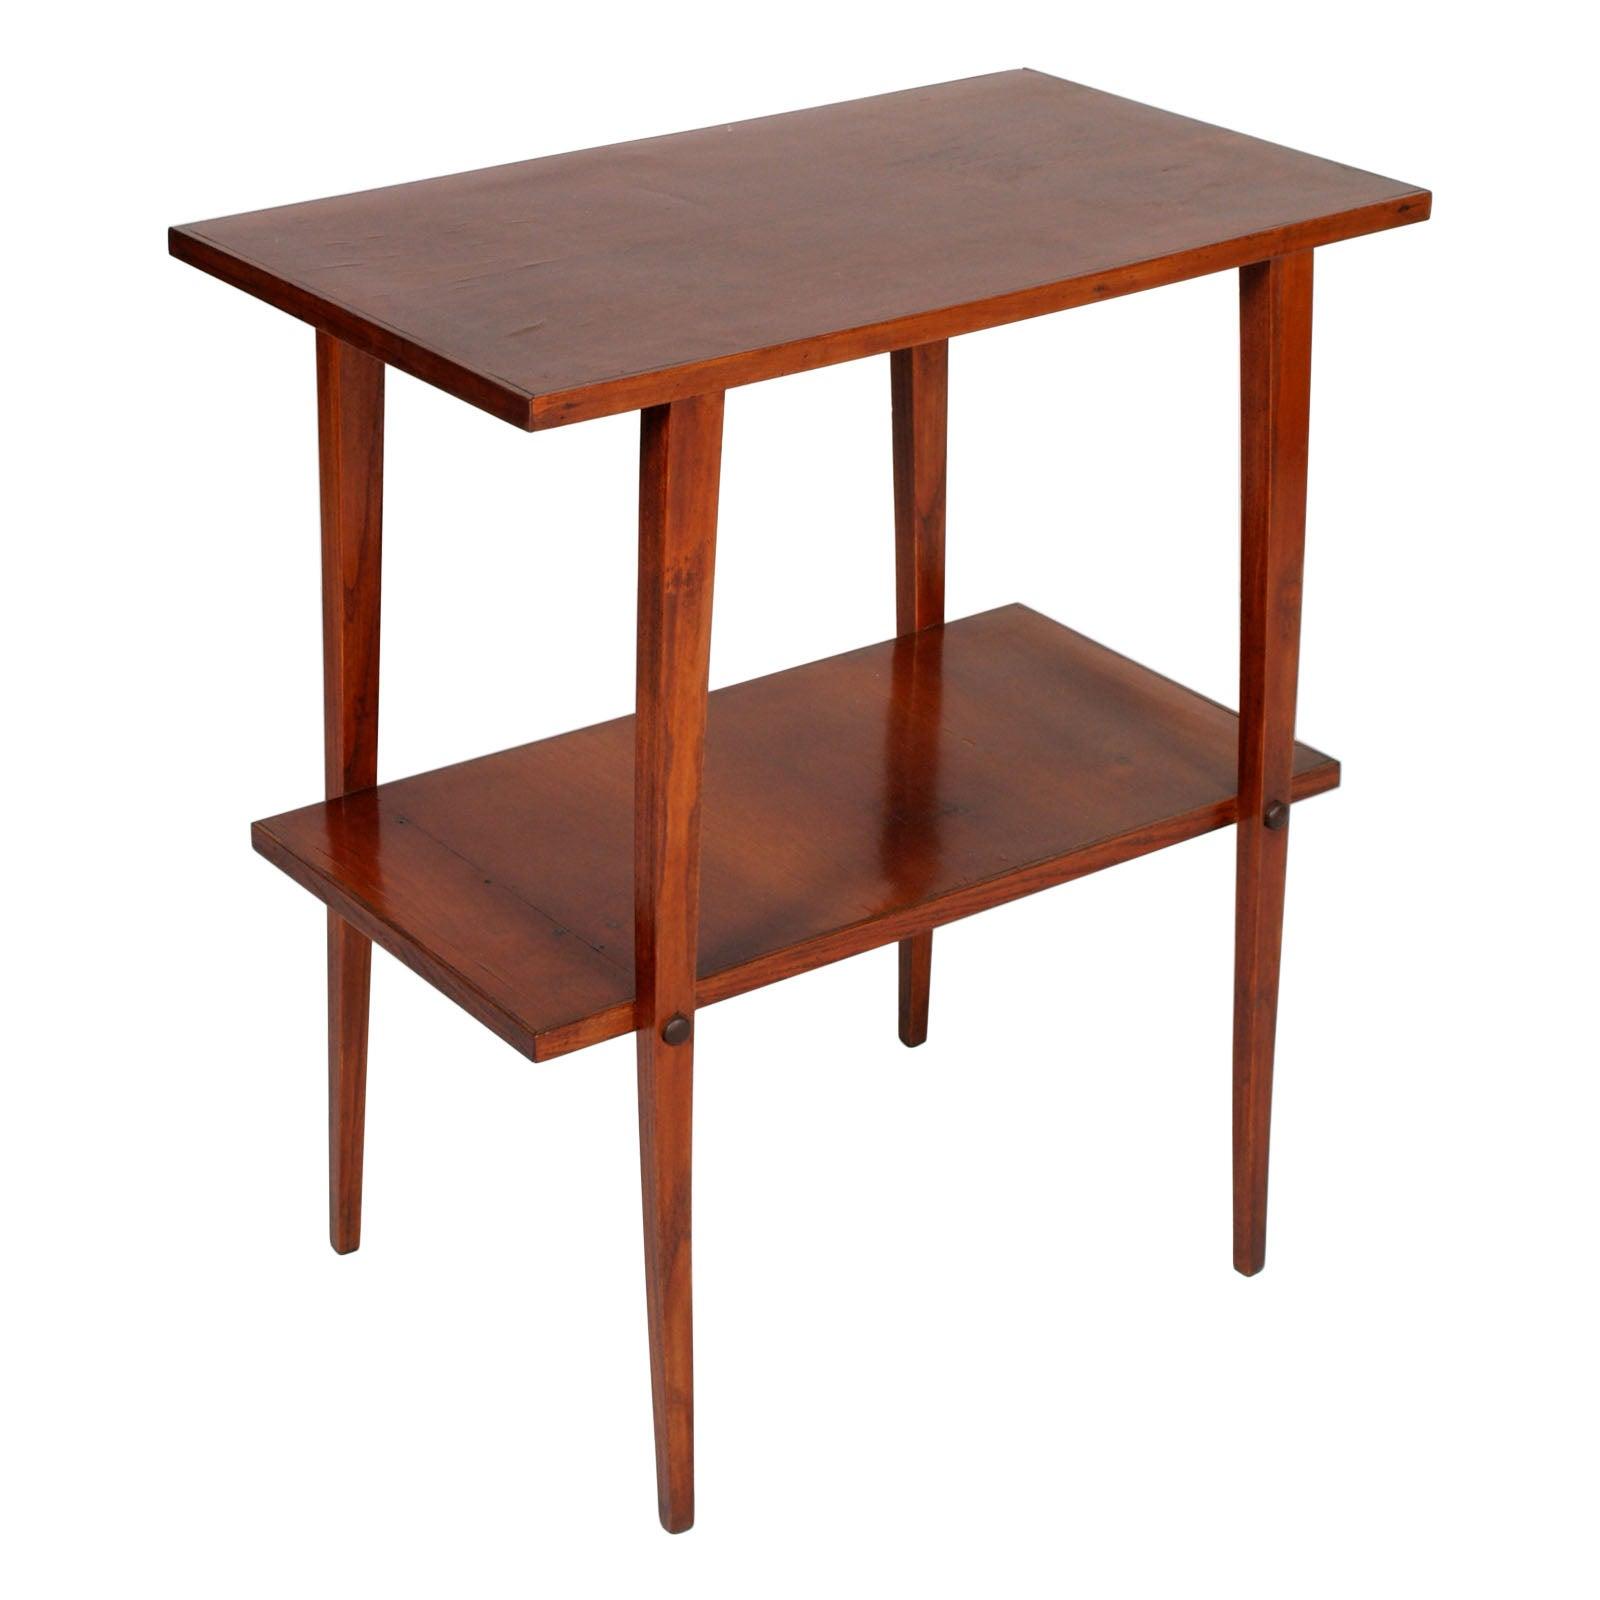 Art Deco Walnut occasional Table with Top in Walnut Slab restored & Wax Polished